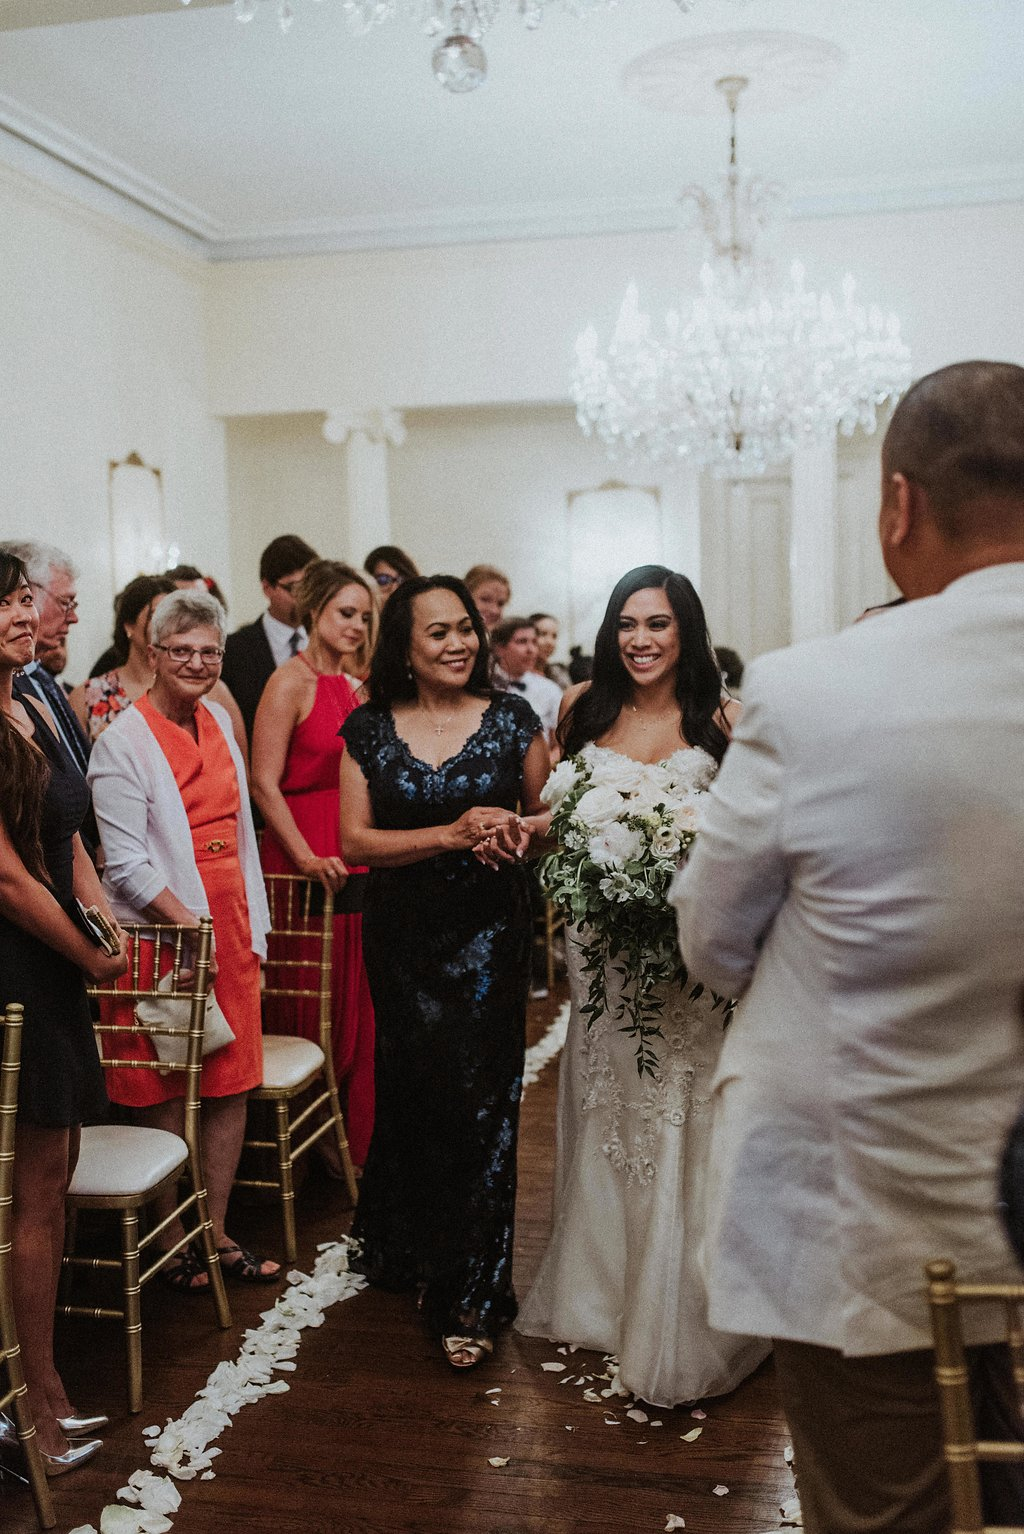 ivory-and-beau-bridal-boutique-alex-and-josephine-meghan-melia-photography-brockington-hall-wedding-savannah-wedding-12.jpg